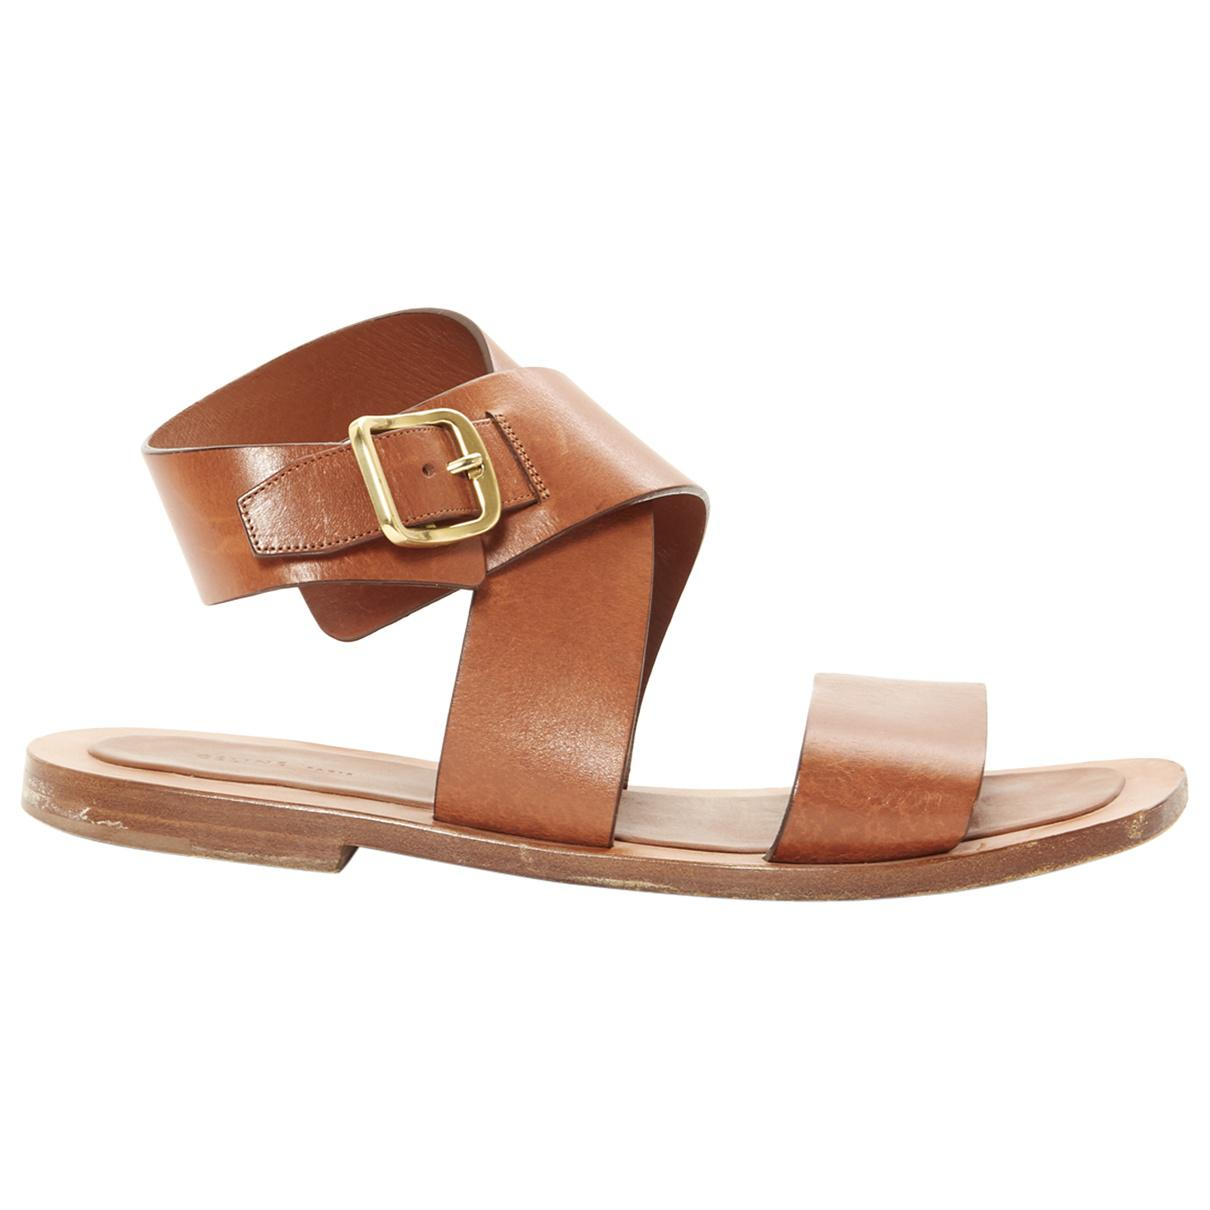 Pre-owned - Leather sandal Celine PtGsgBx